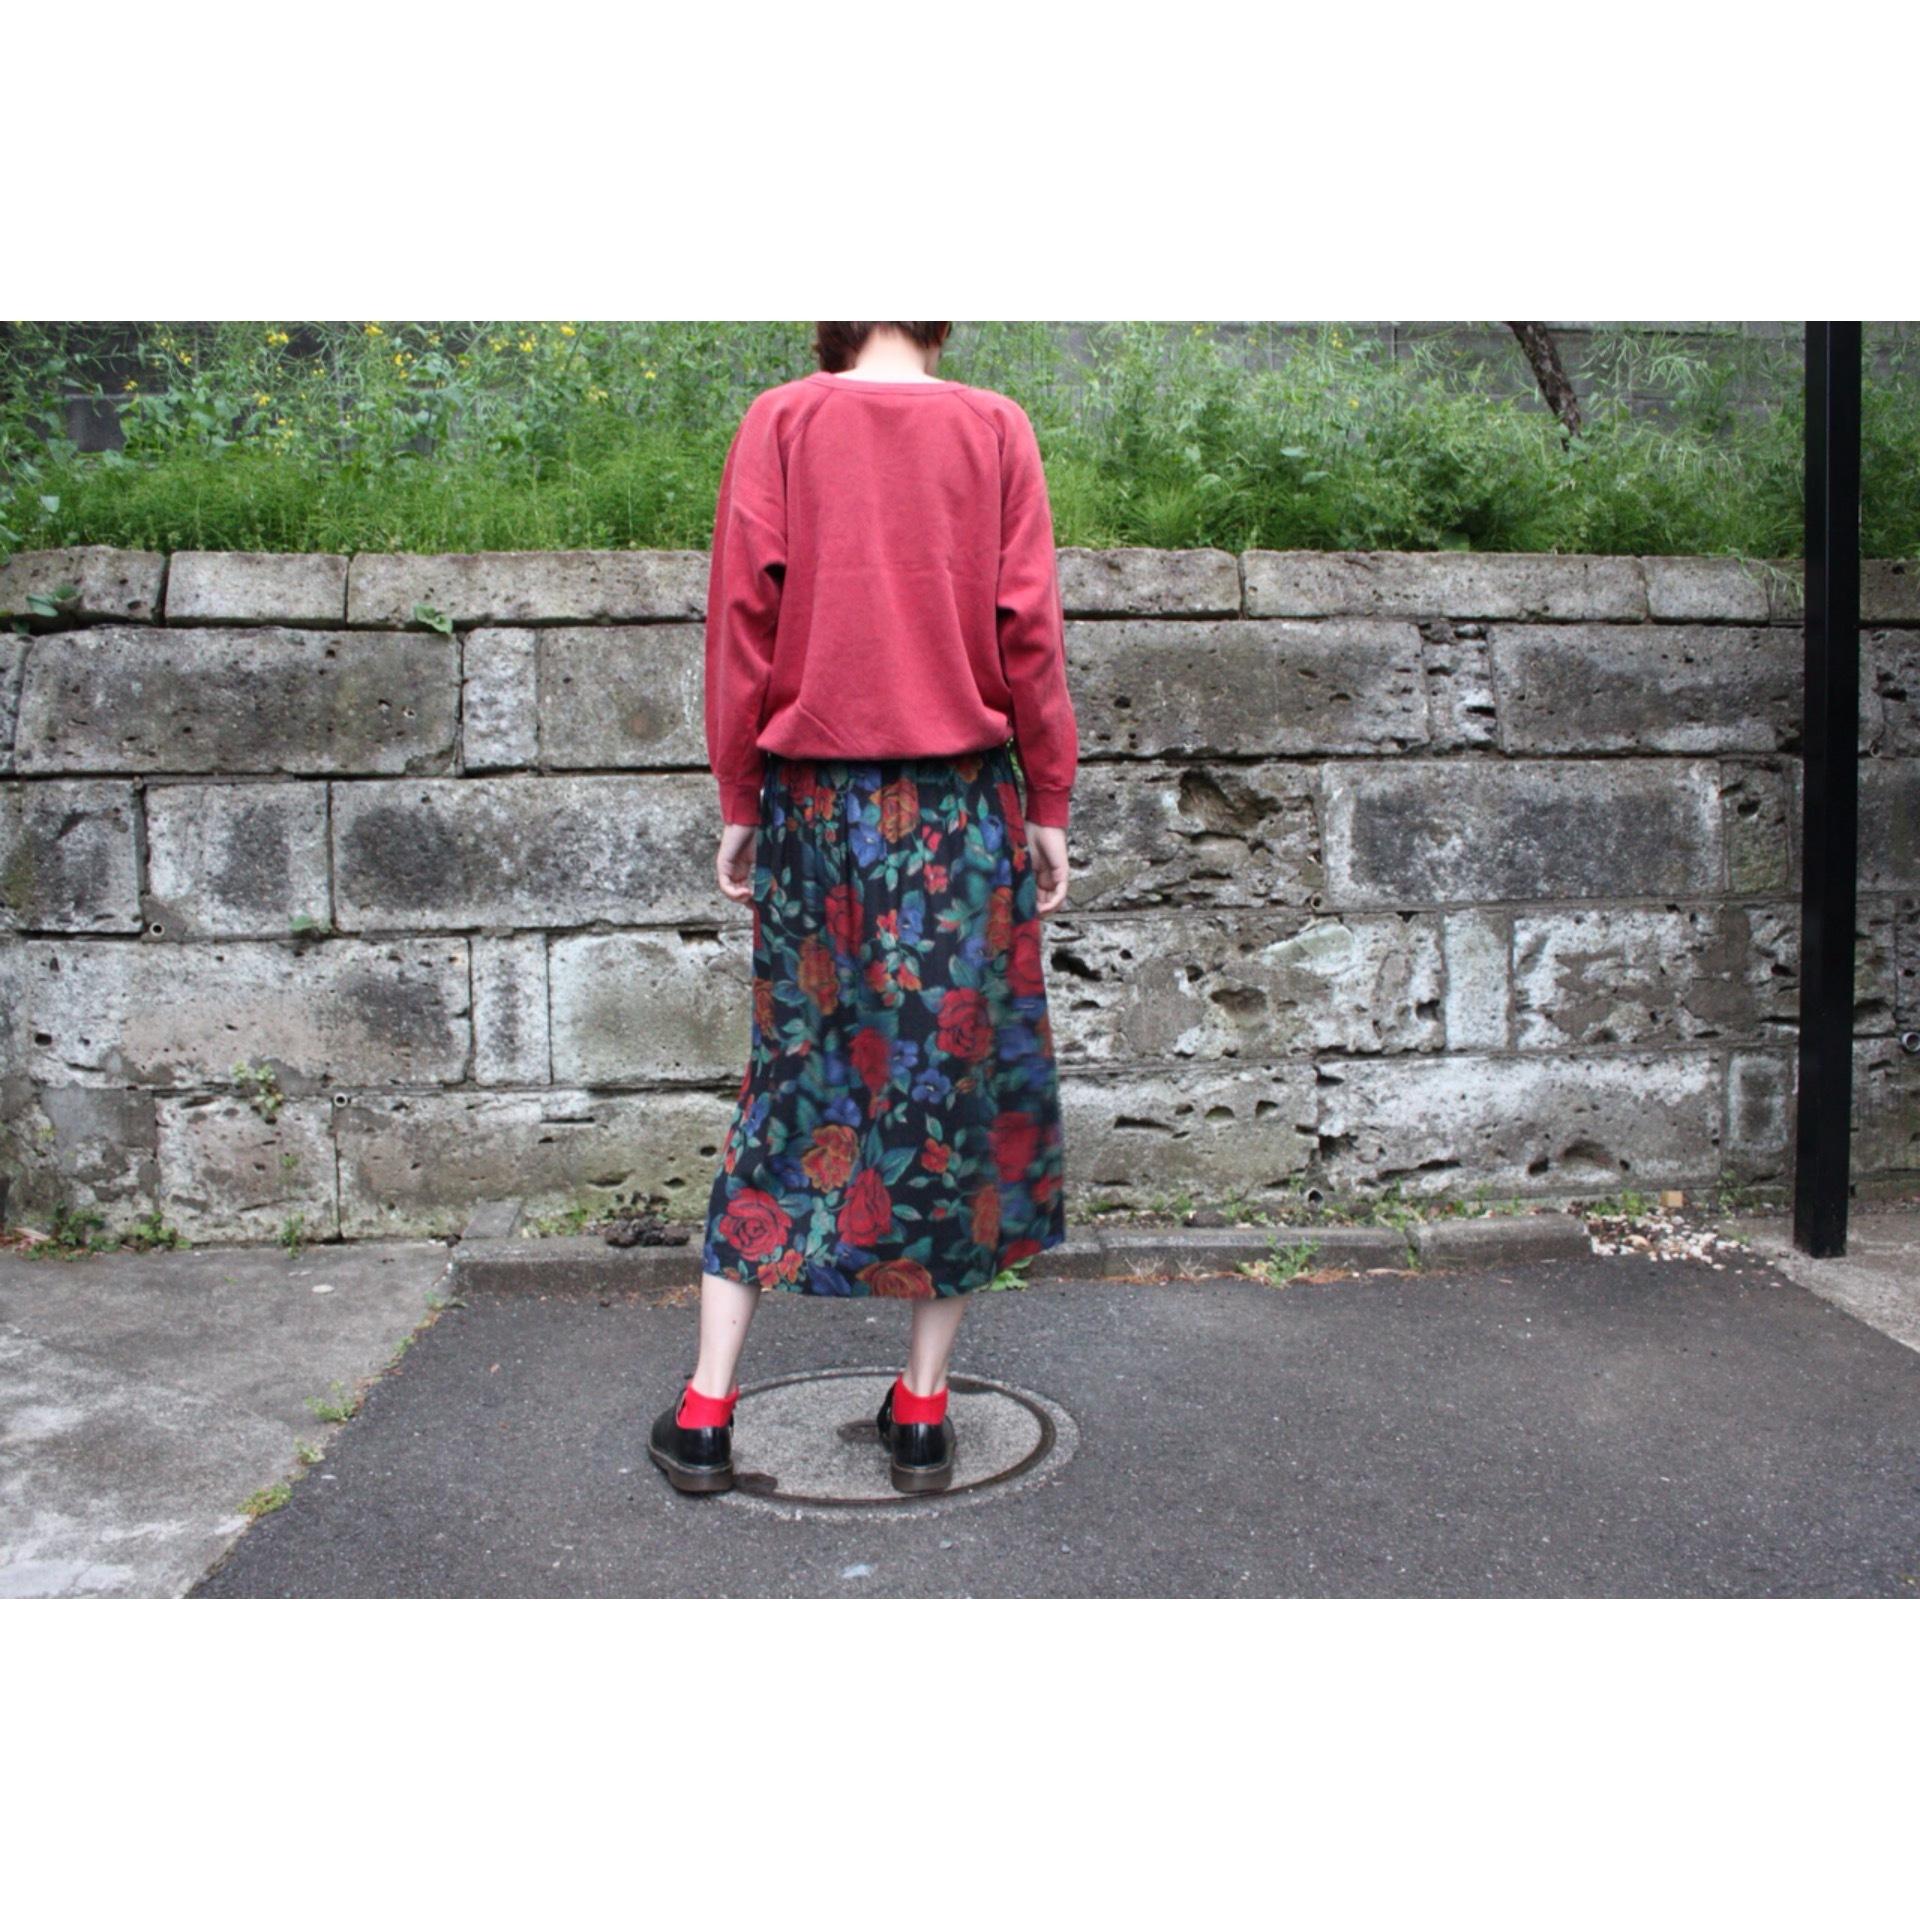 Vintage flower pattern skirt